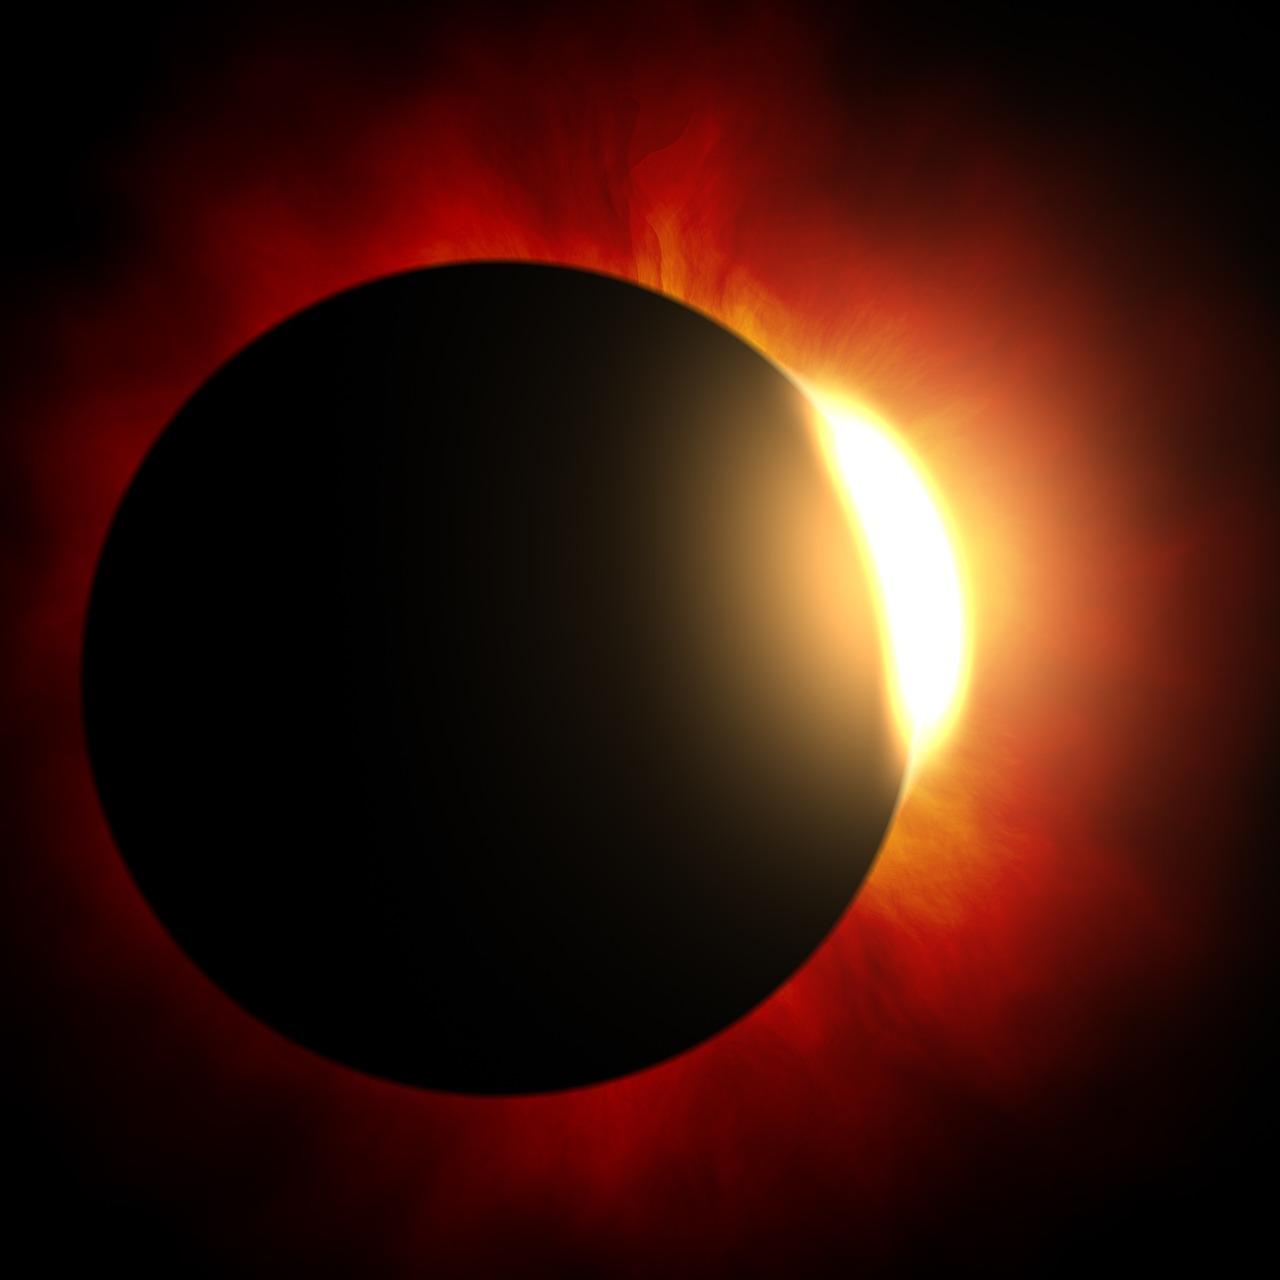 solar-eclipse-1115920_1280